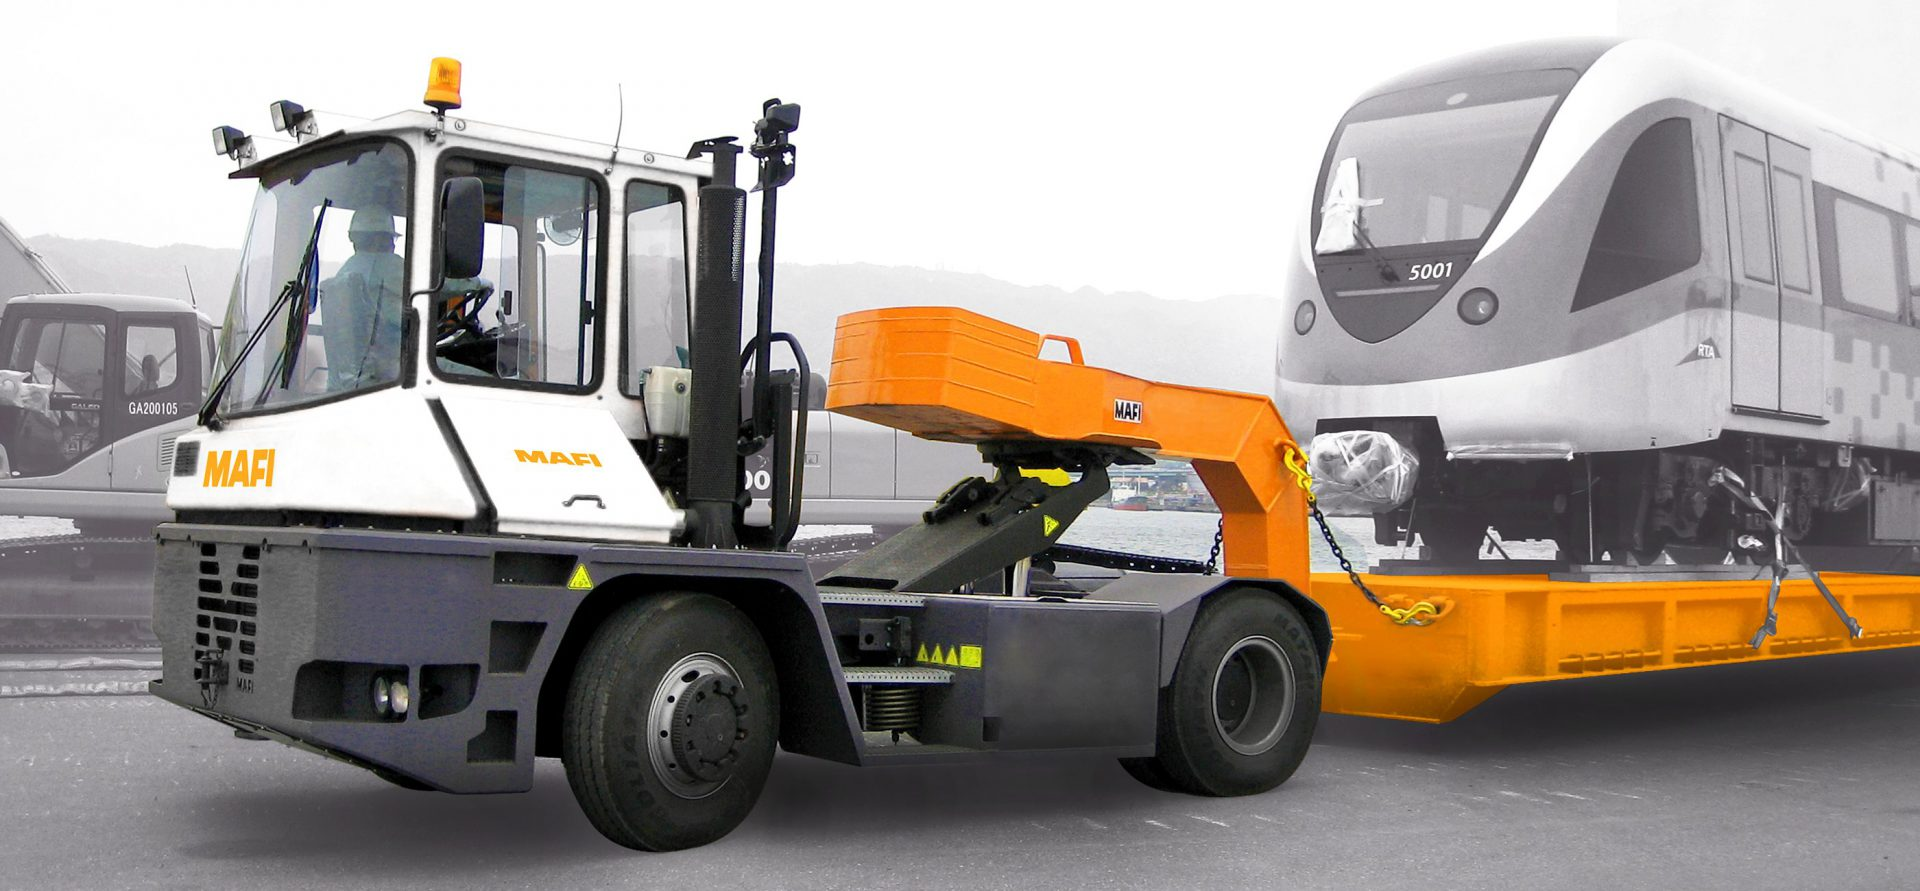 Cargotrailer ROLLtrailer